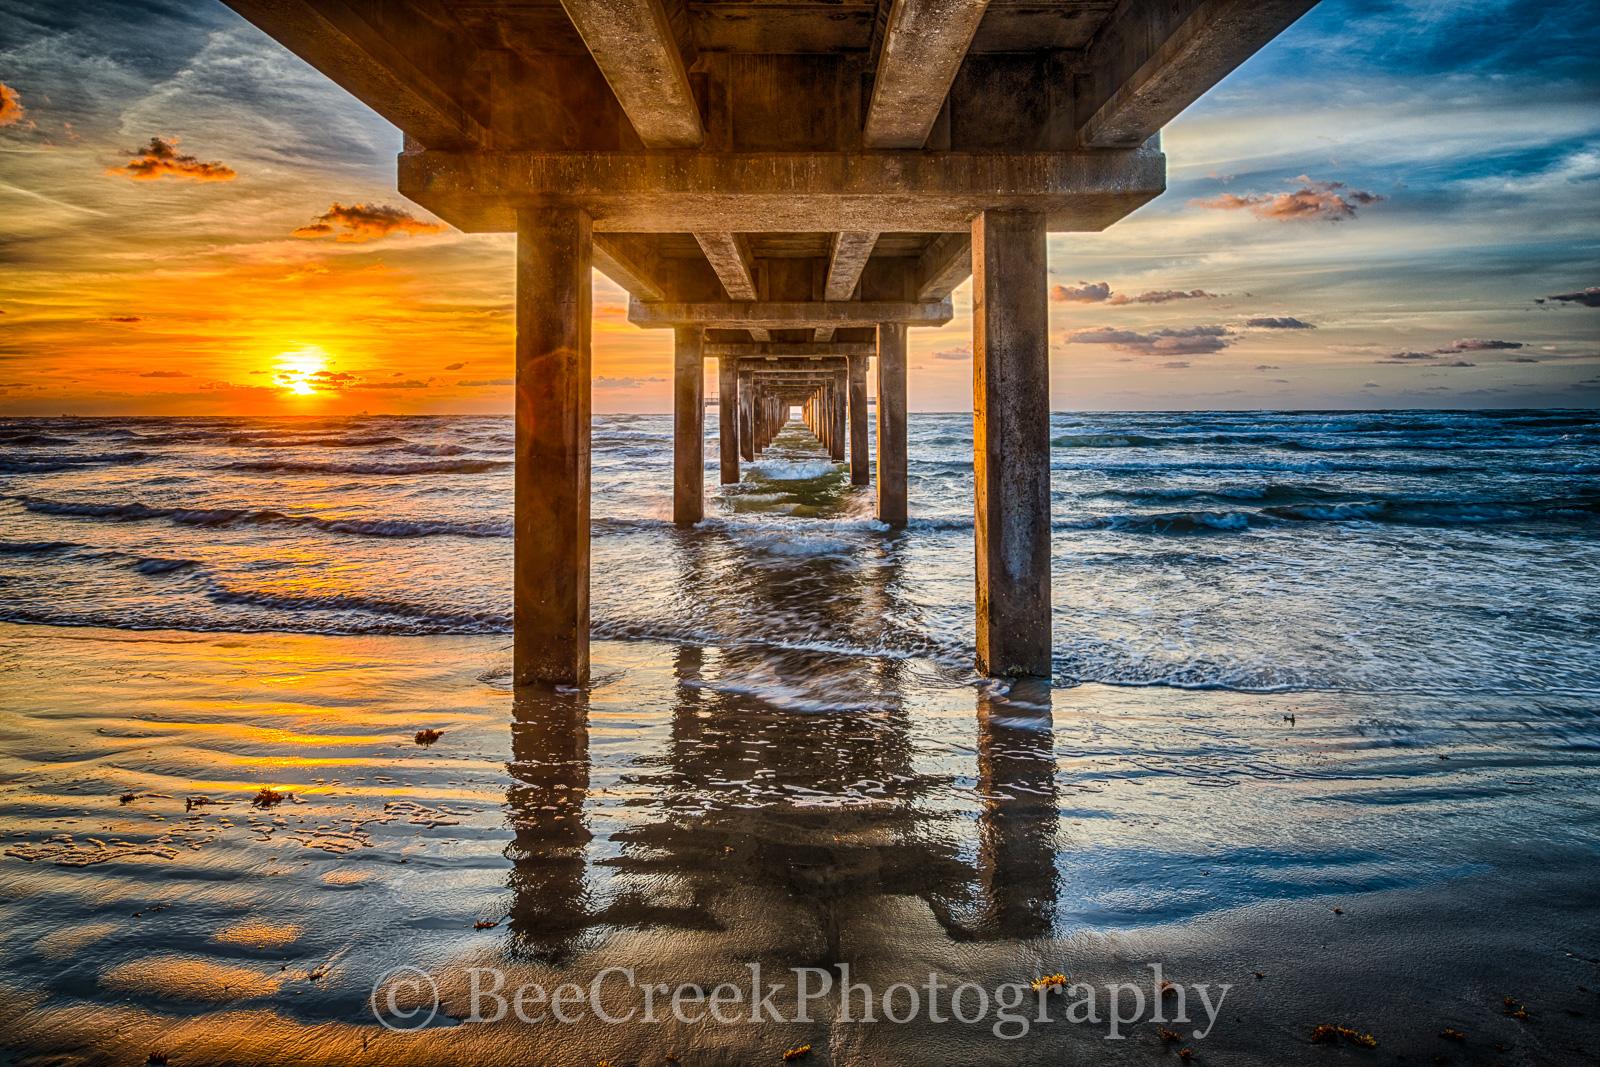 Caldwell pier, Port A, Texas pier, texas piers, Port Aransas, Sunrise, Texas Coast, Texas beach, Texas coastal landscape, beach, beach ocean, coast, coastal, colorful sunrise, fishing pier, gulf of me